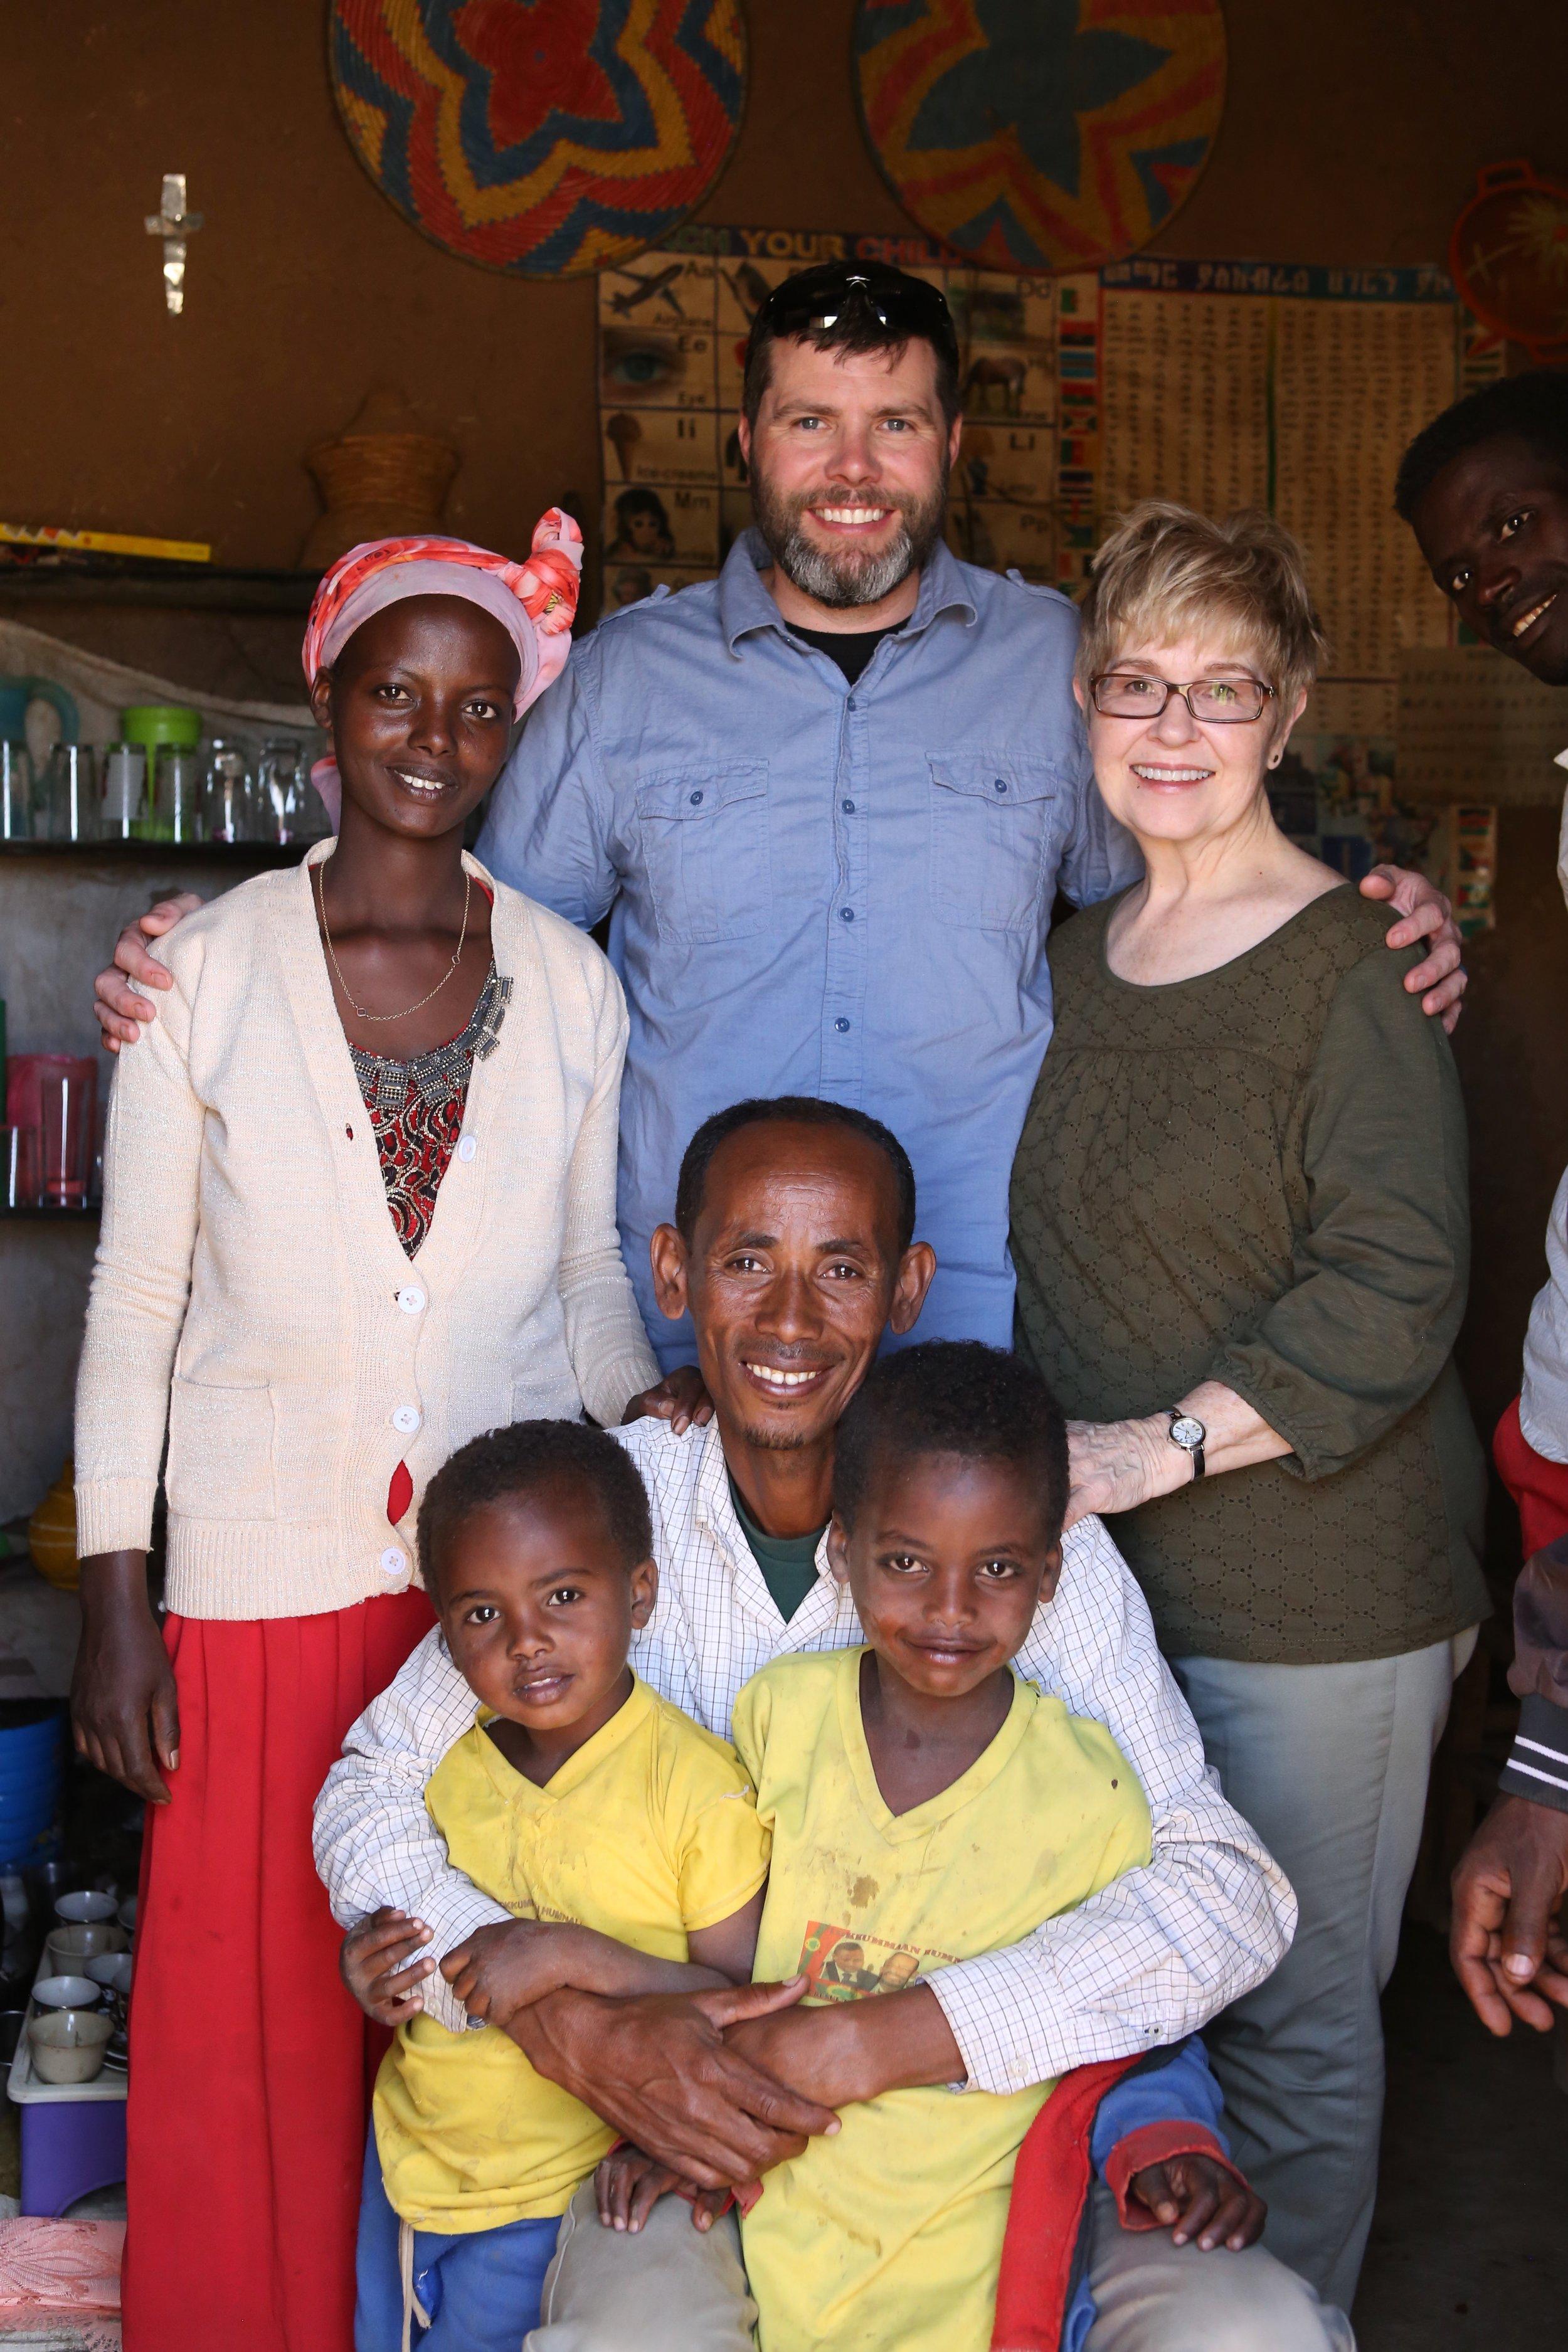 Ethiopia-Jason with family.jpeg